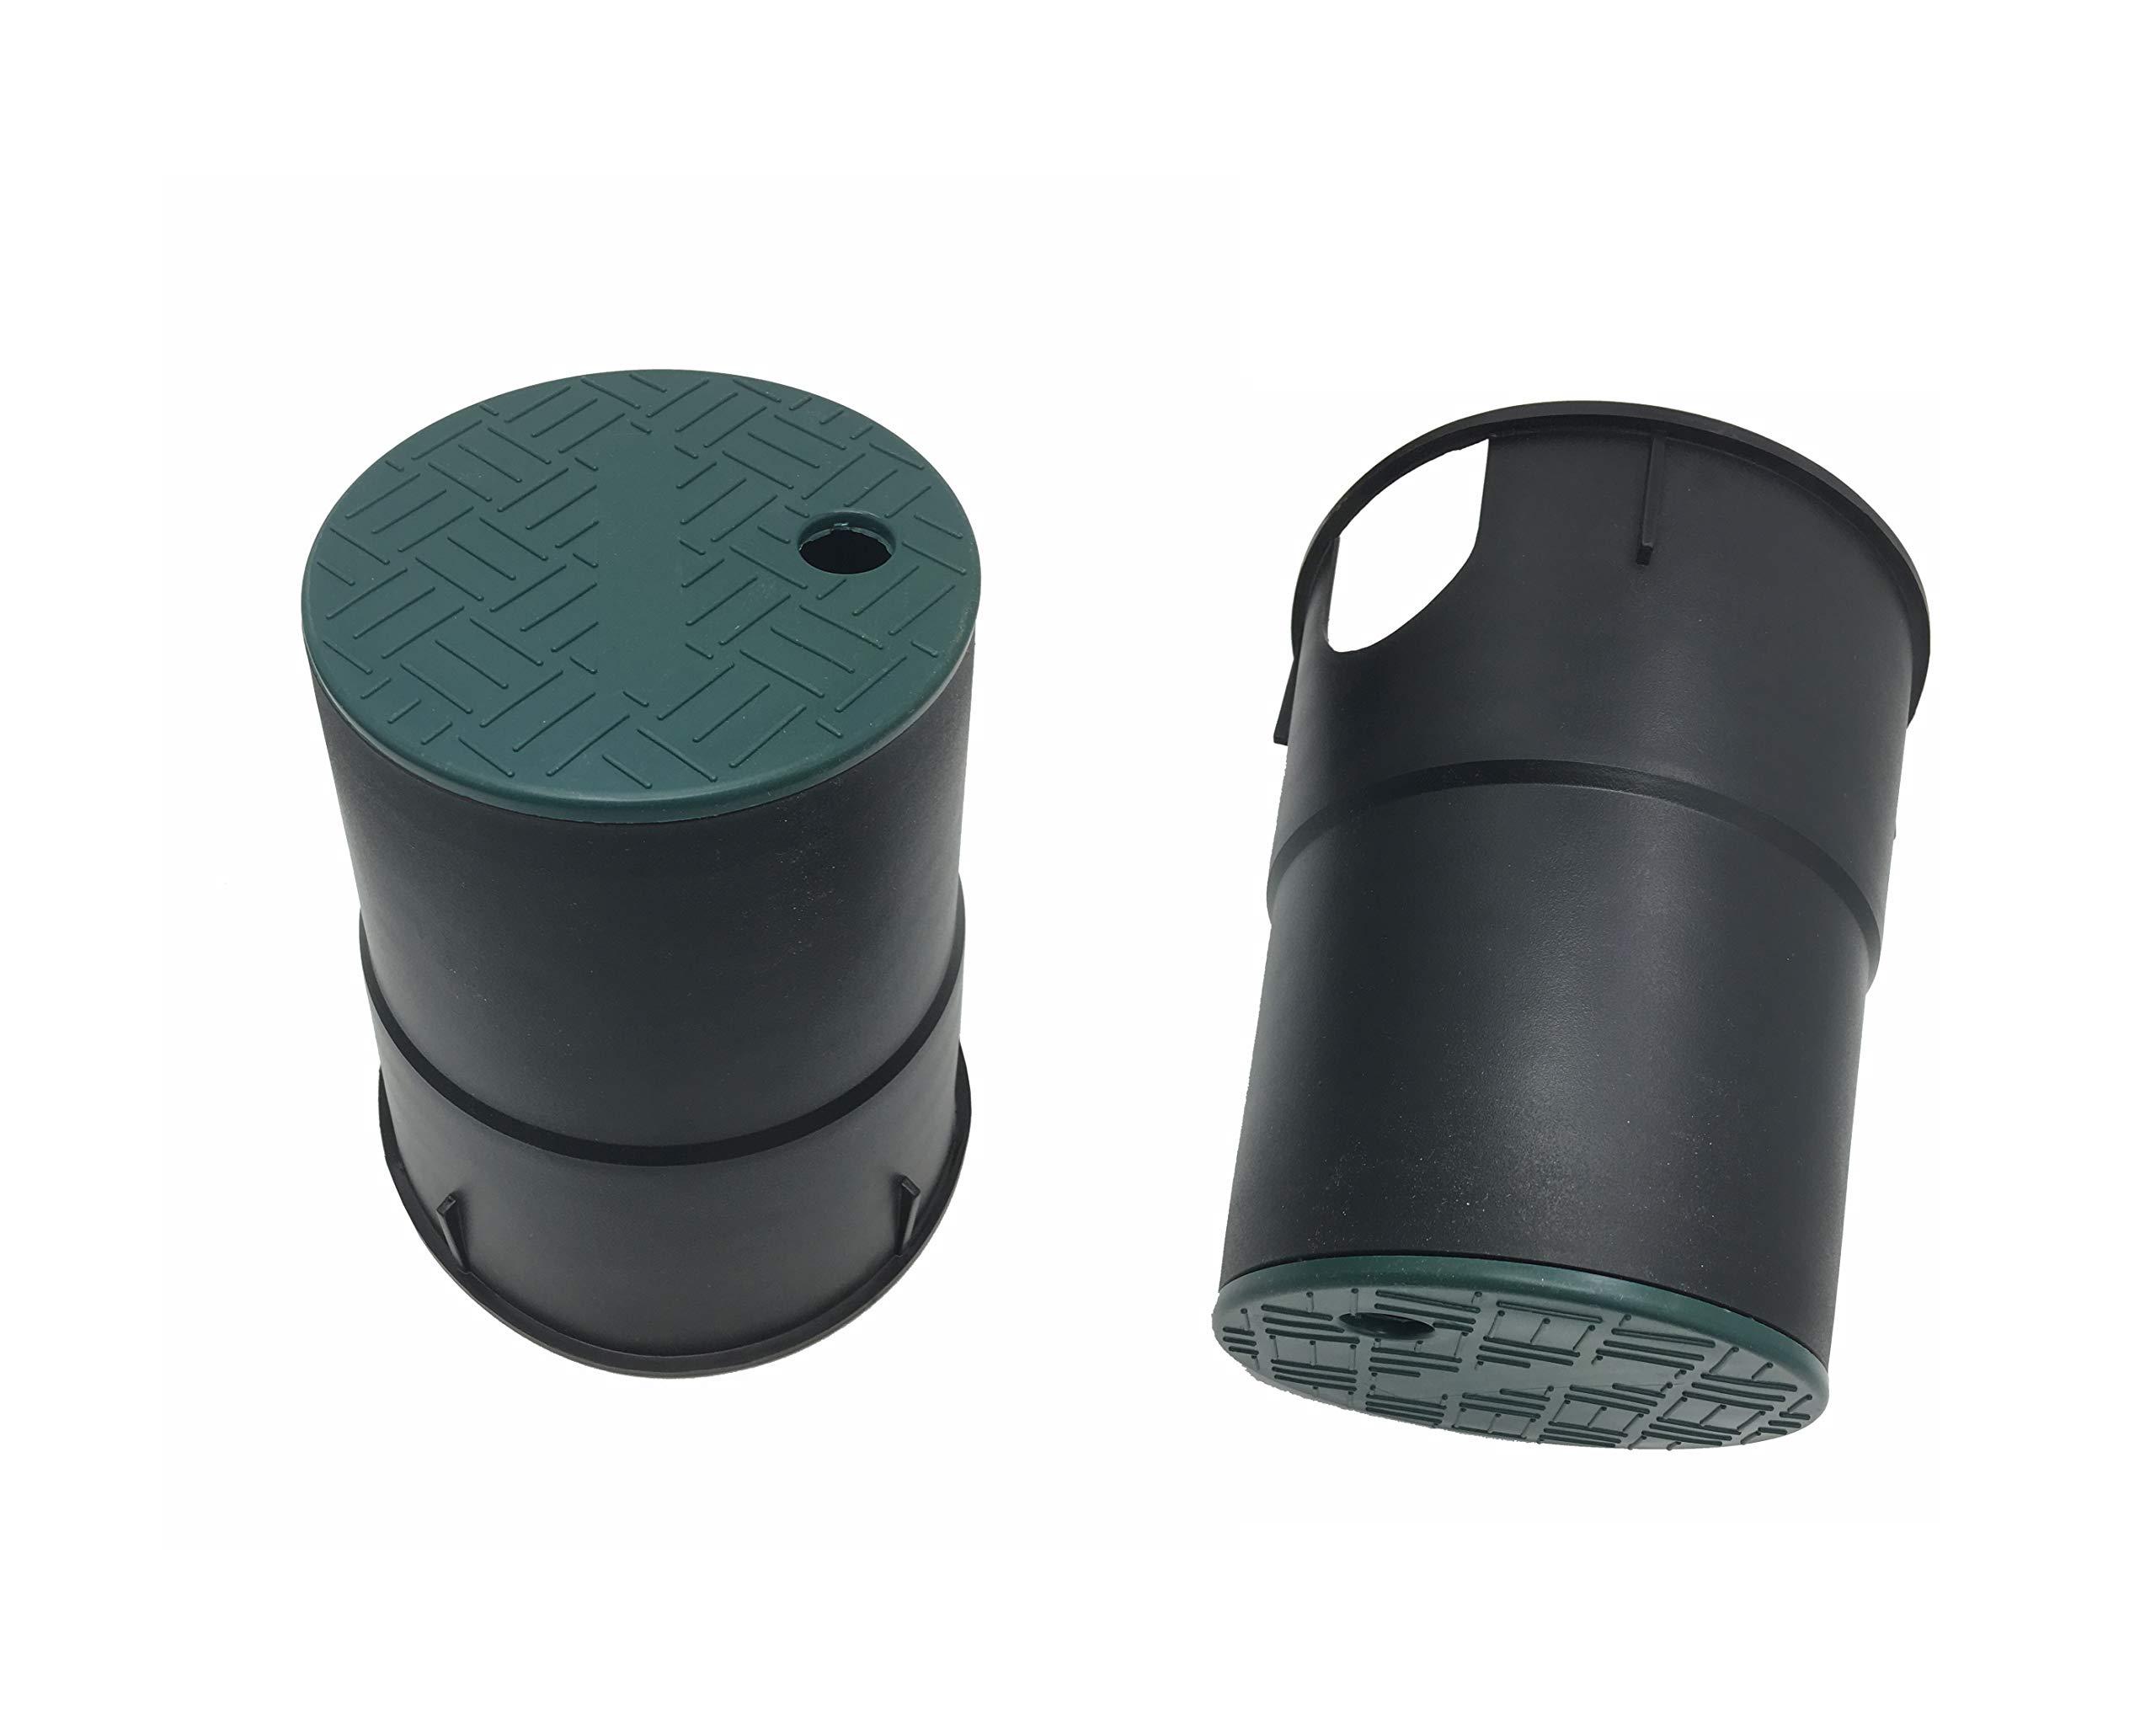 Leader_Pneumatic Valve Box Cover 6'' Round Sprinkler System Irrigation Circular Valve Box,2 Pack by Leader_Pneumatic